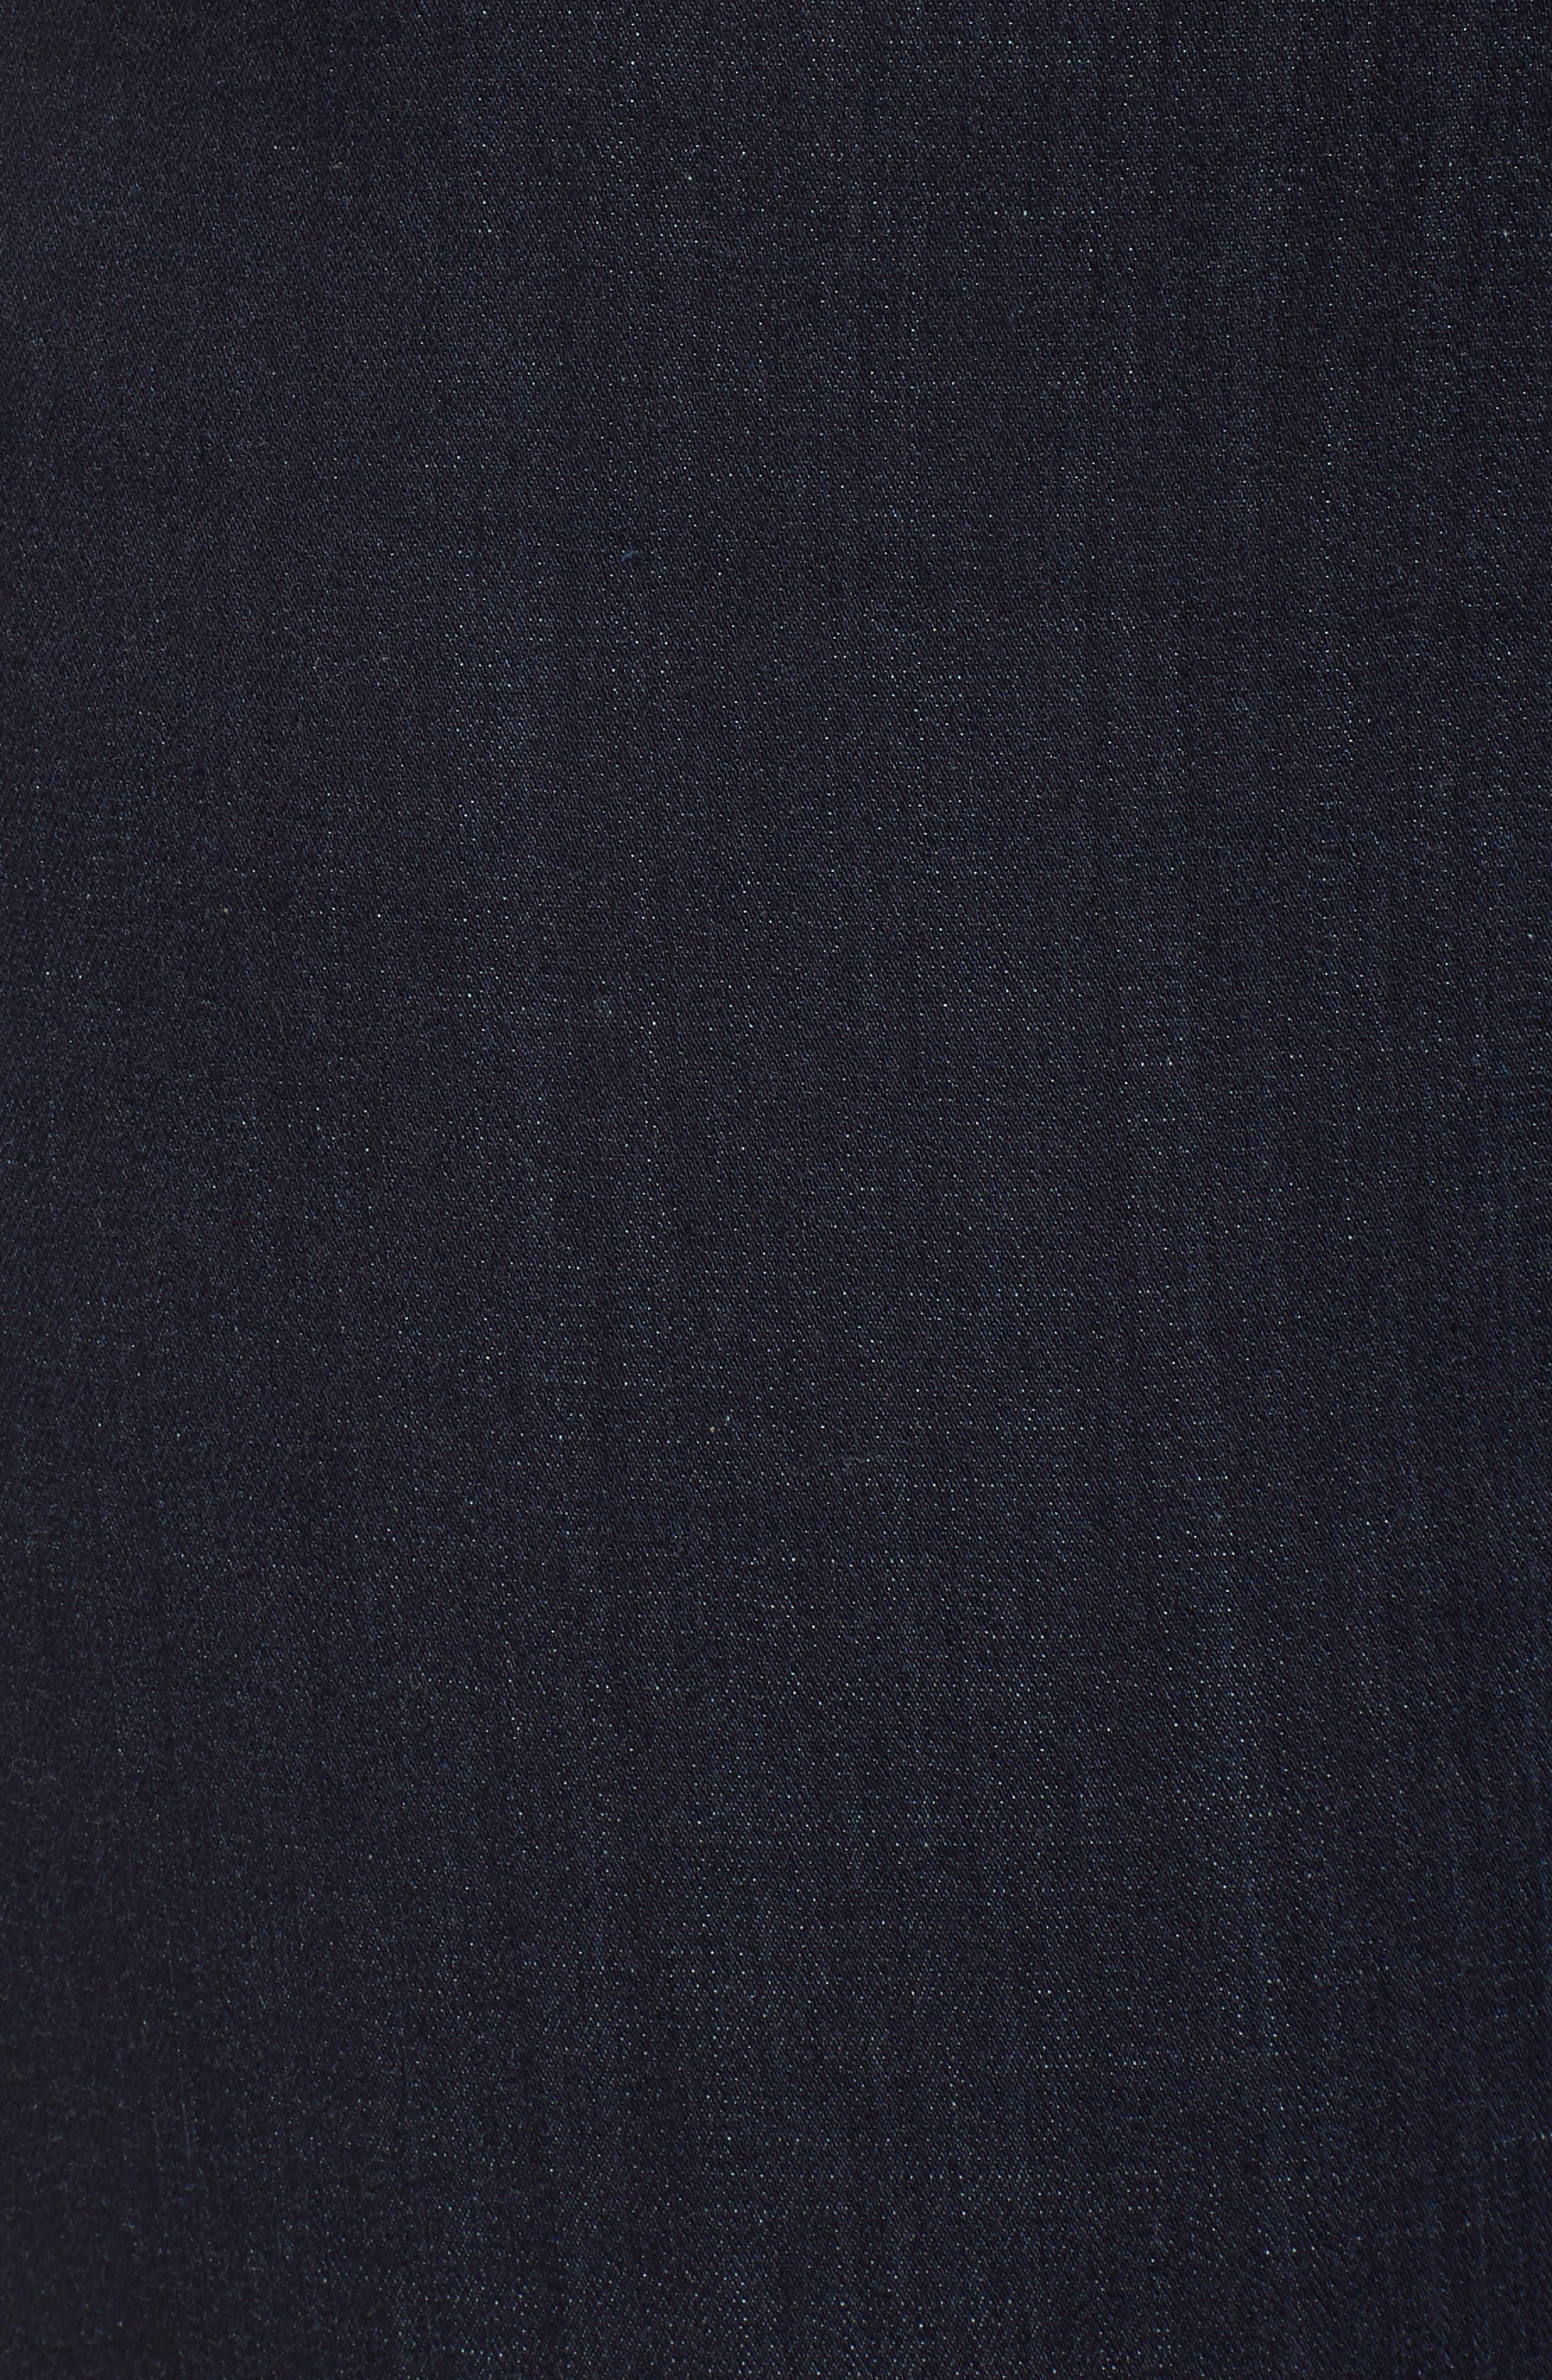 Stretch Skinny Jeans,                             Alternate thumbnail 6, color,                             DARK RINSE